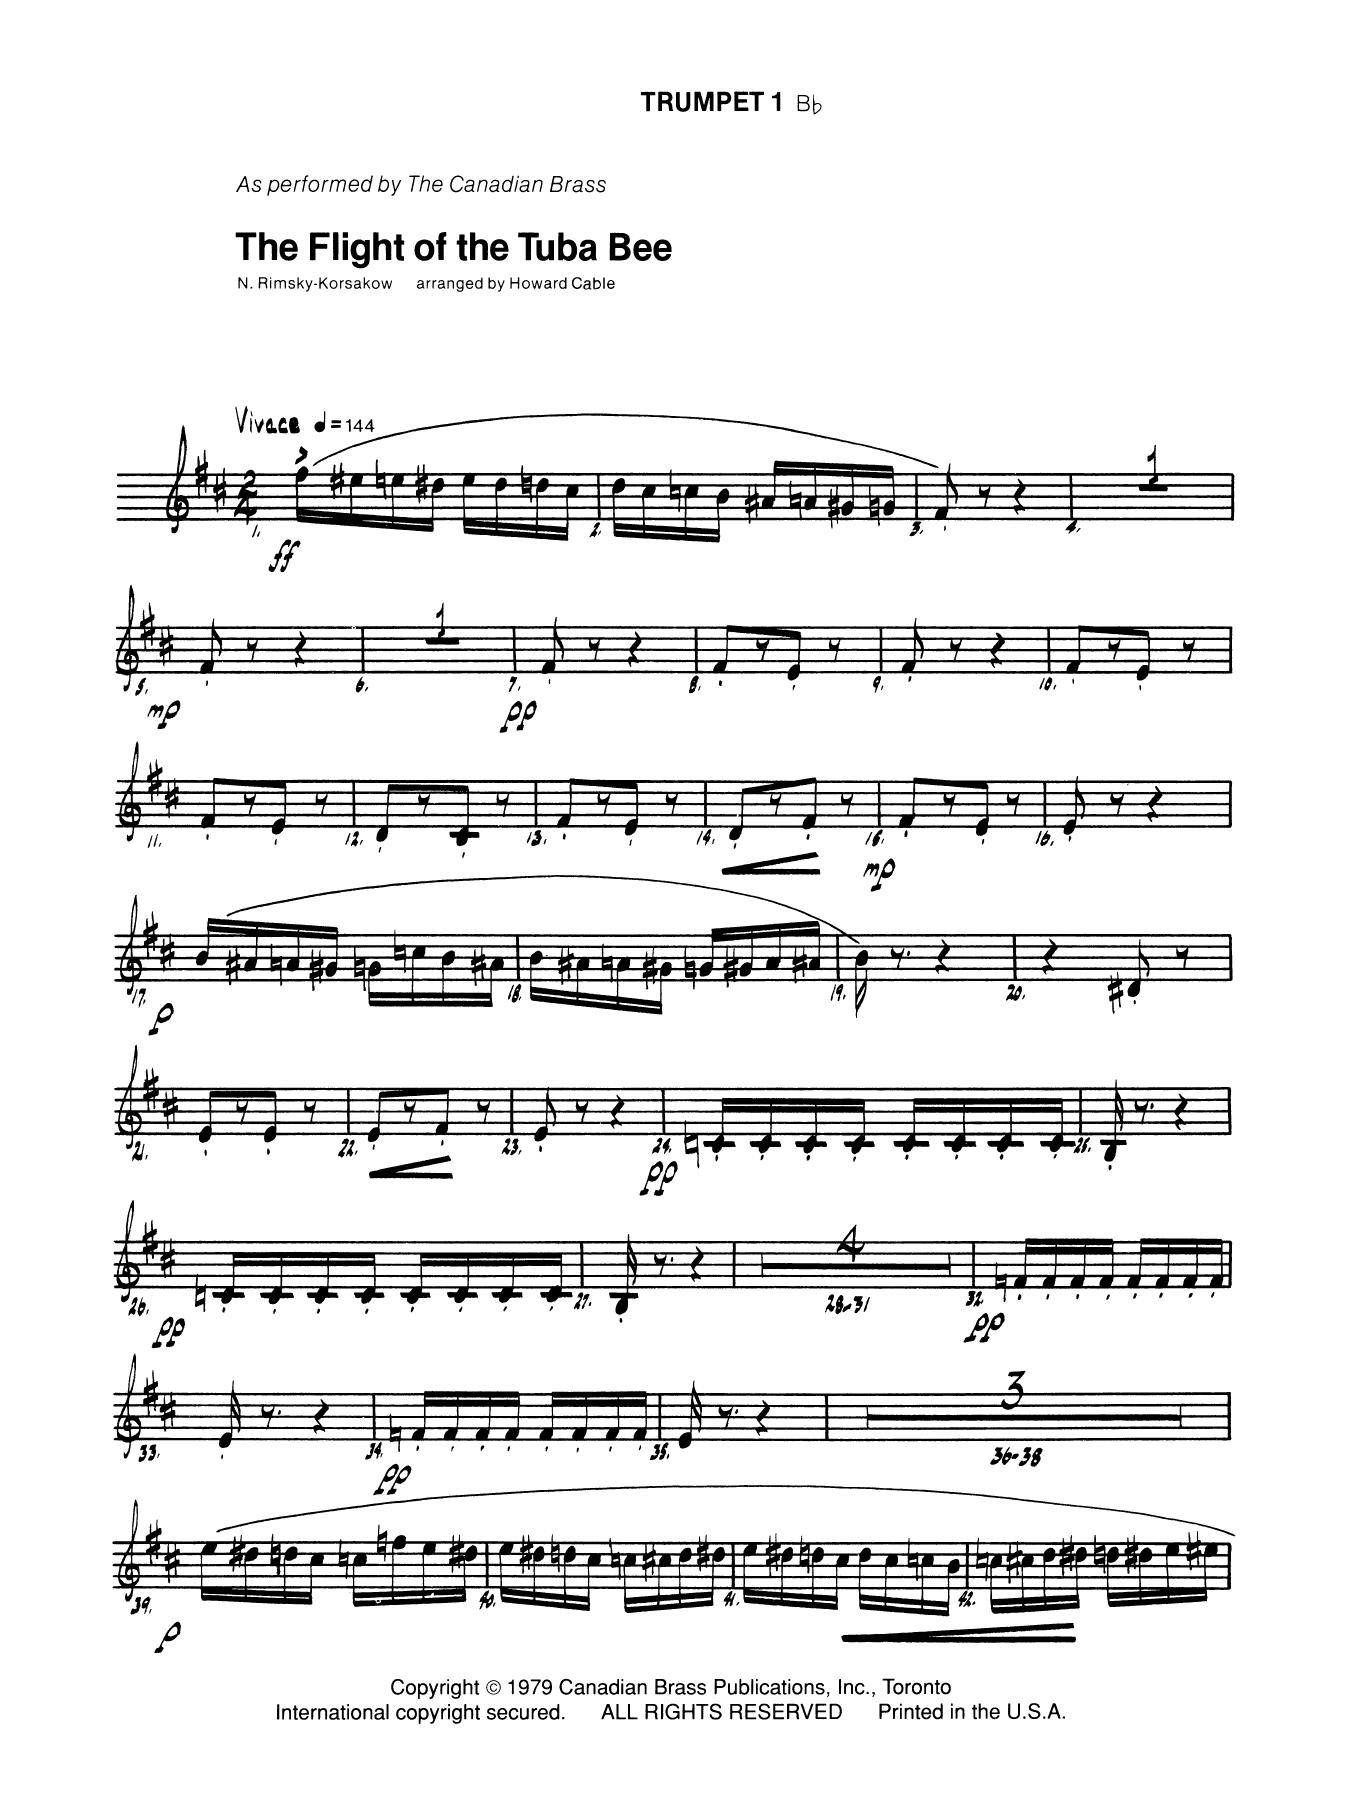 The Flight of the Tuba Bee - Bb Trumpet 1 (Brass Quintet) Sheet Music